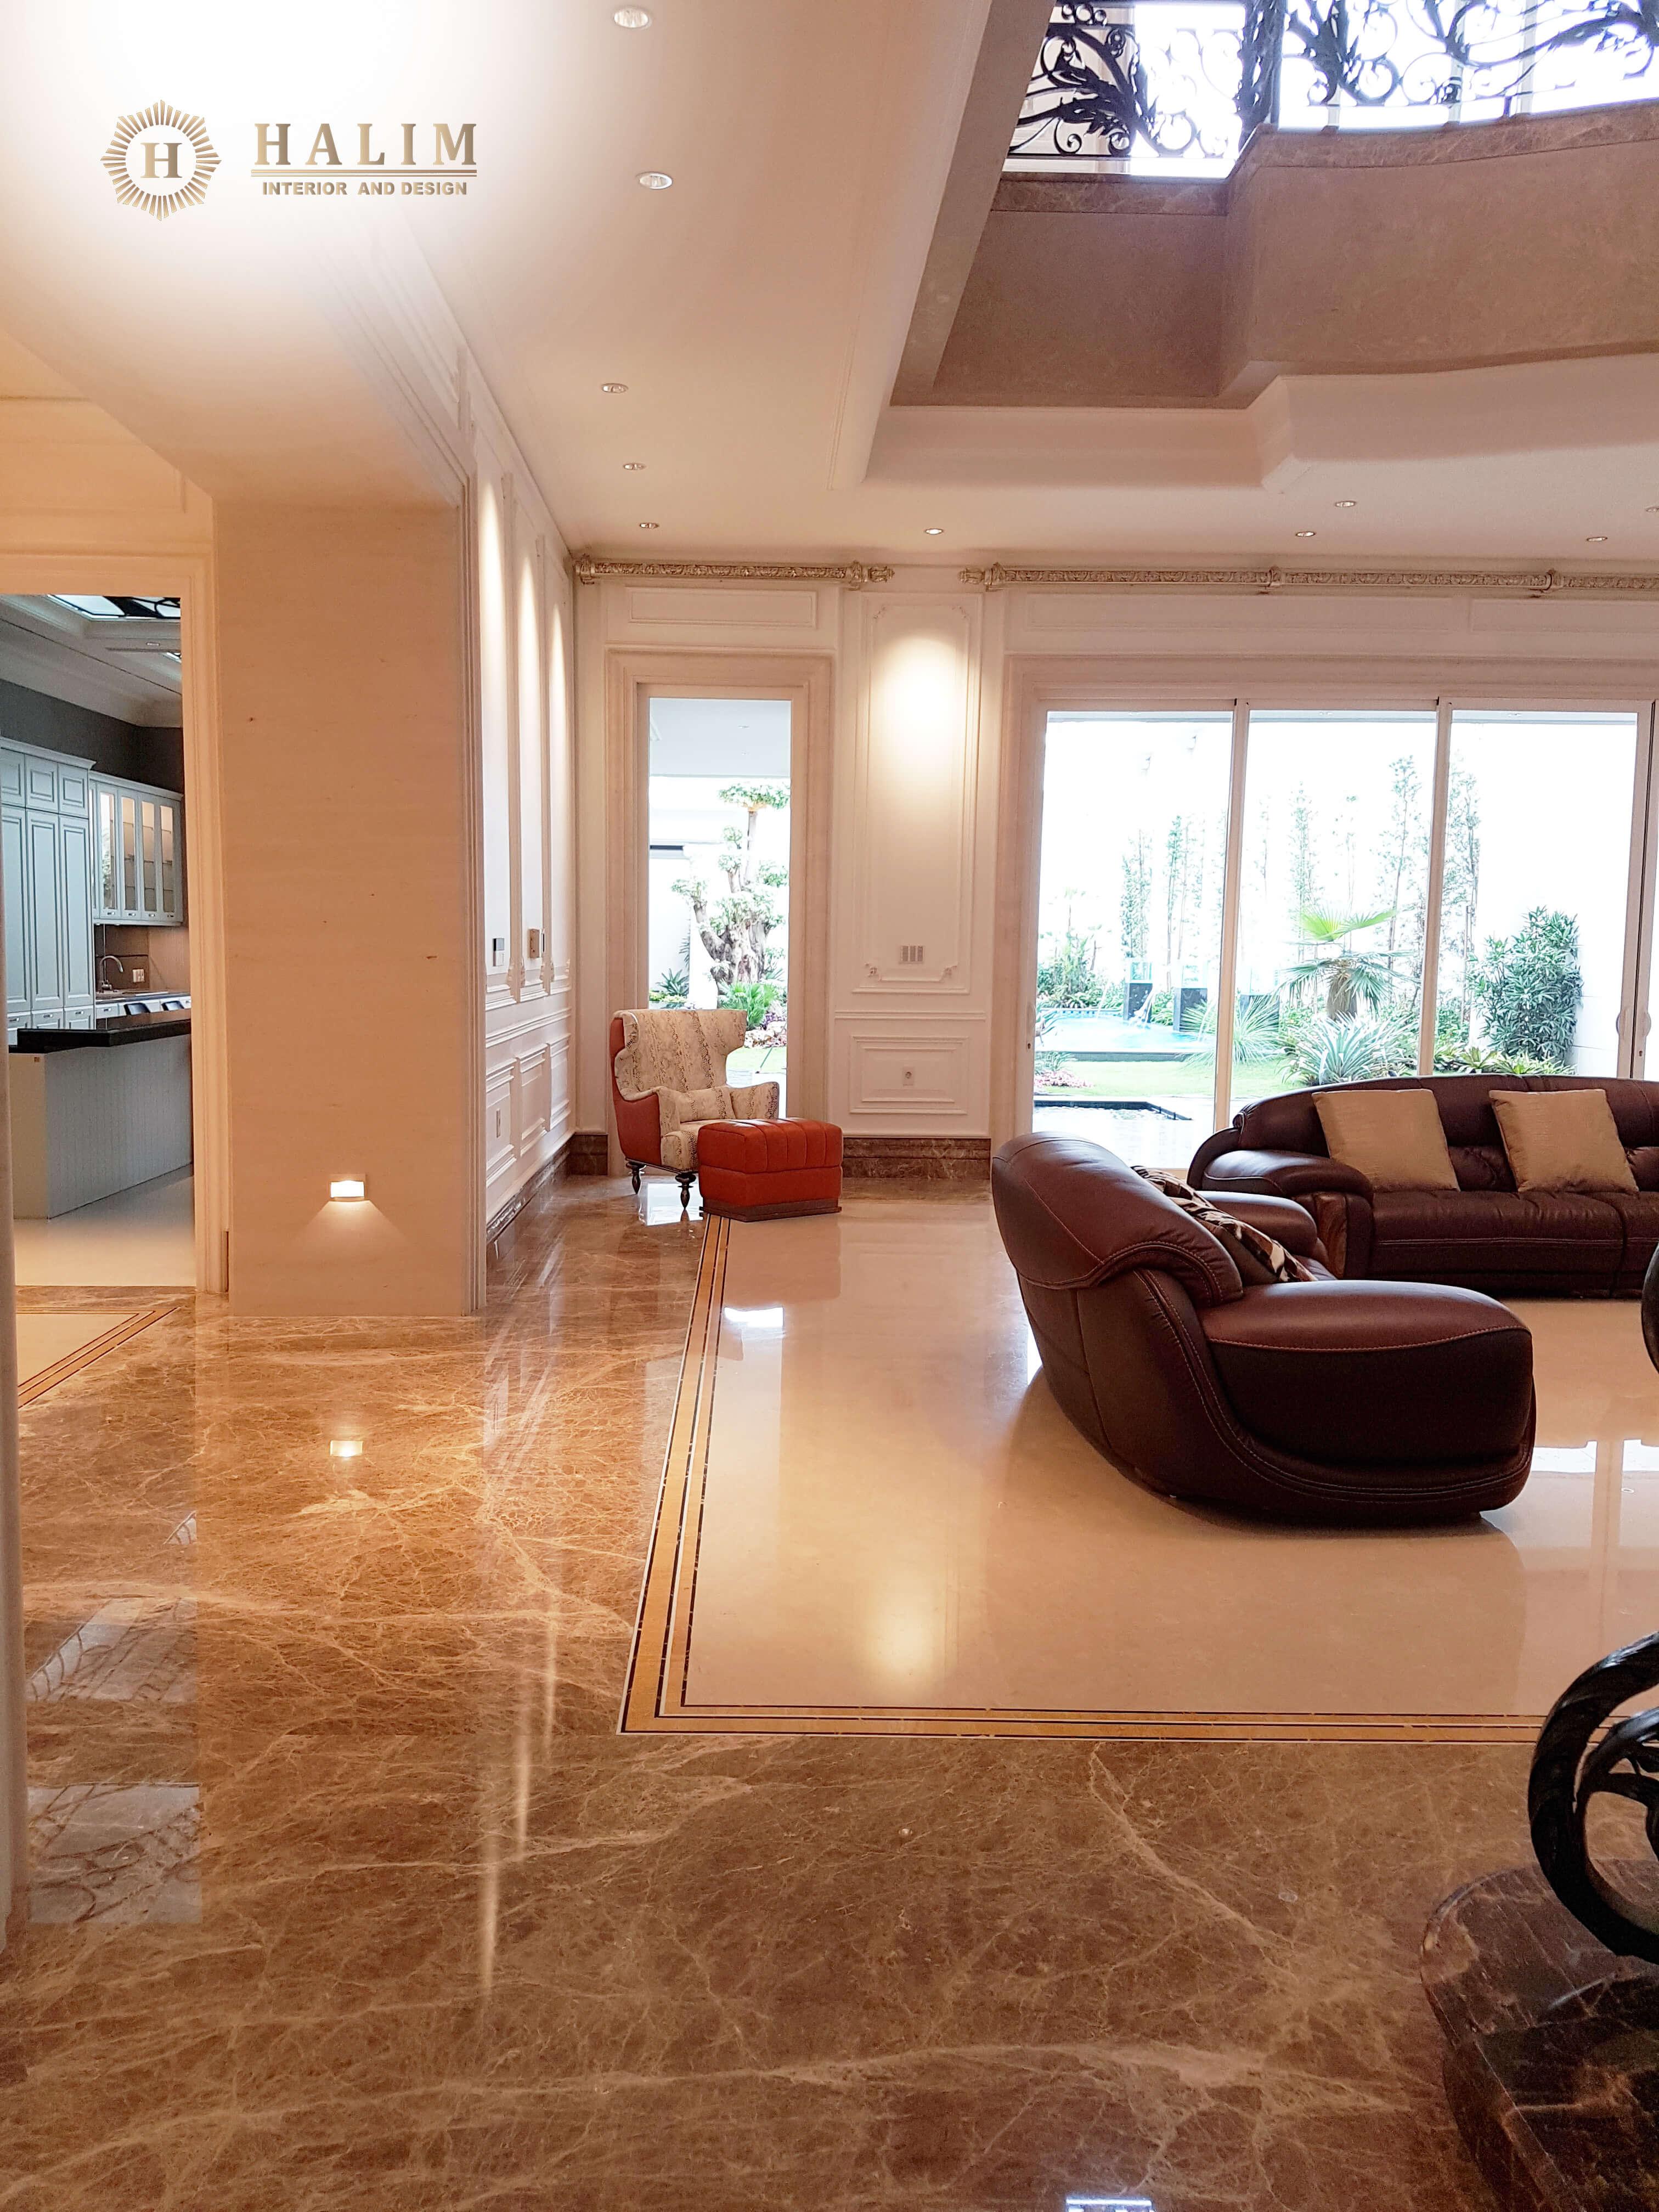 Halim, Interior, modern, furniture, contemporer american style, minimalist, european, classic, surabaya, Kertajaya 2B. Ruang Keluarga Lt 1